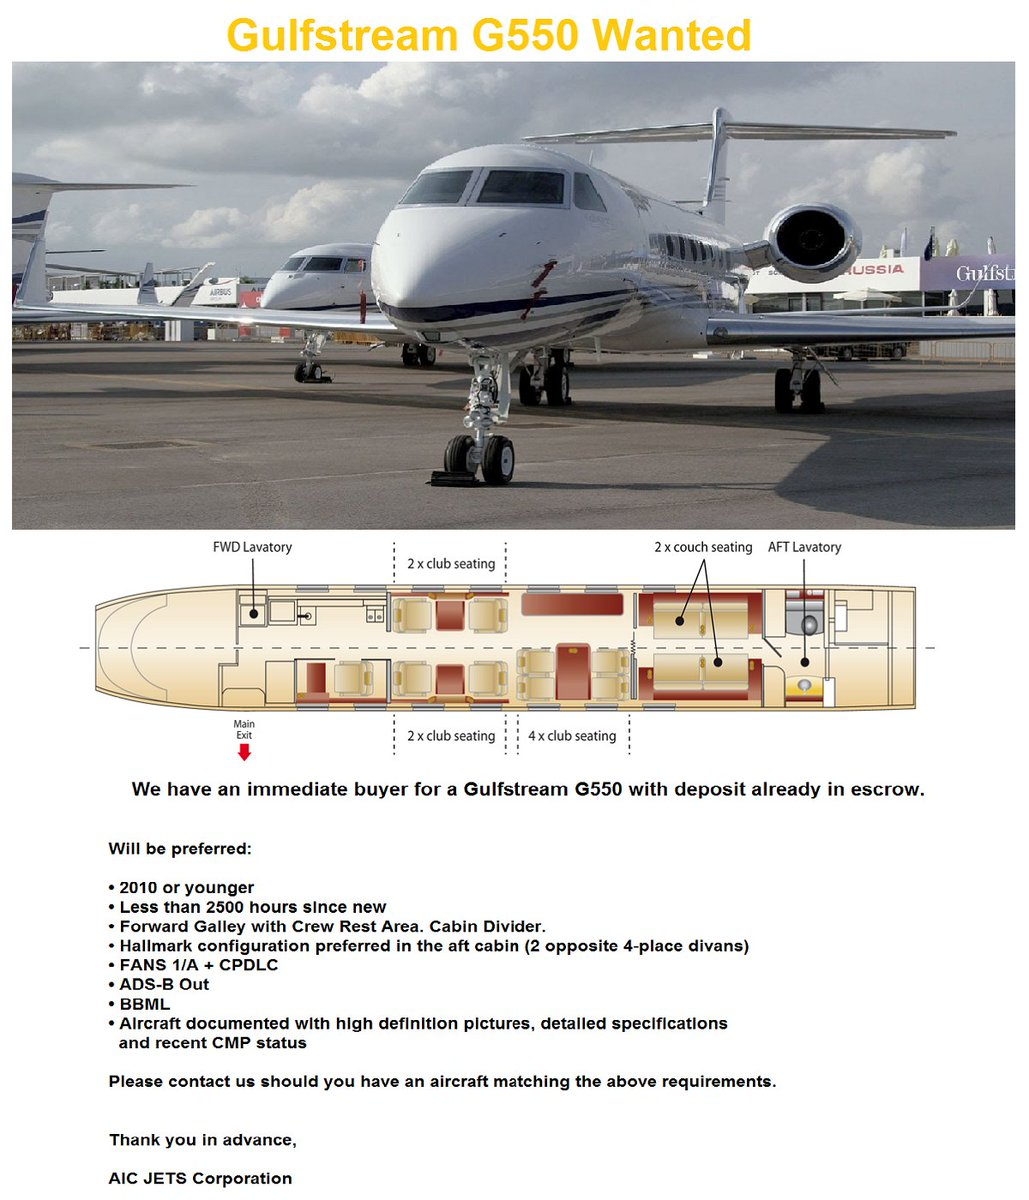 We have buyer for #Gulfstream G550 #AICJETSCorporation #AICJETSUSA  #AICJETSUAE  http://www. aicjetscorp.com  &nbsp;     http://www. linkedin.com/company/aicjet scorporation &nbsp; … <br>http://pic.twitter.com/vsEy20aT9Q